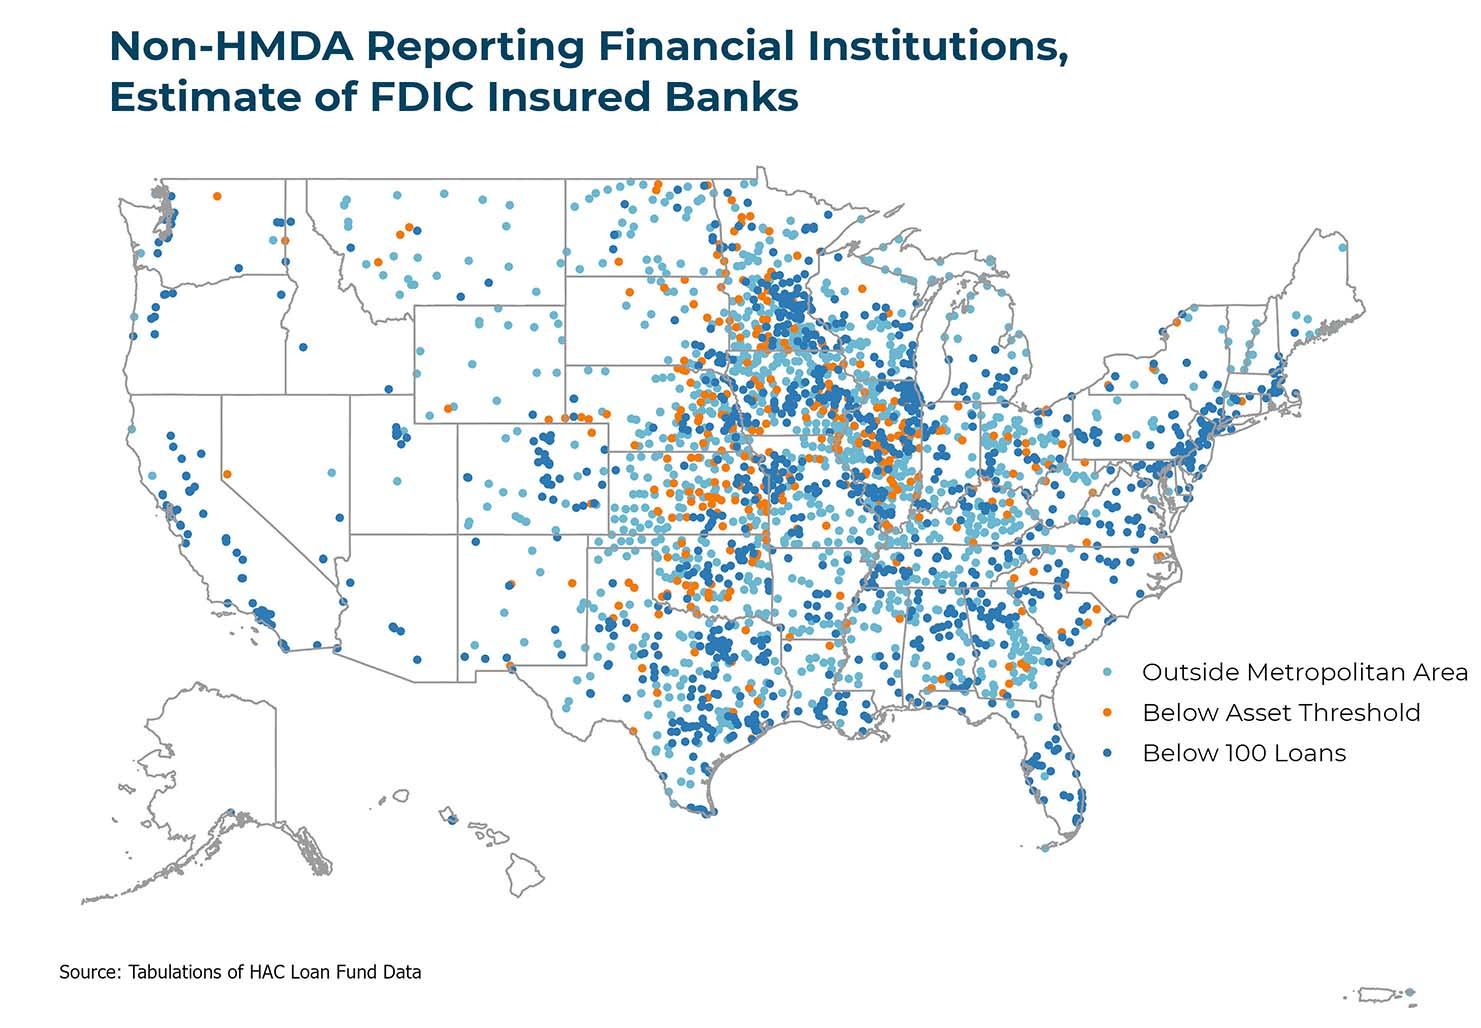 Non-HMDA Reporting Financial Institutions, Estimate of FDIC Insured Banks